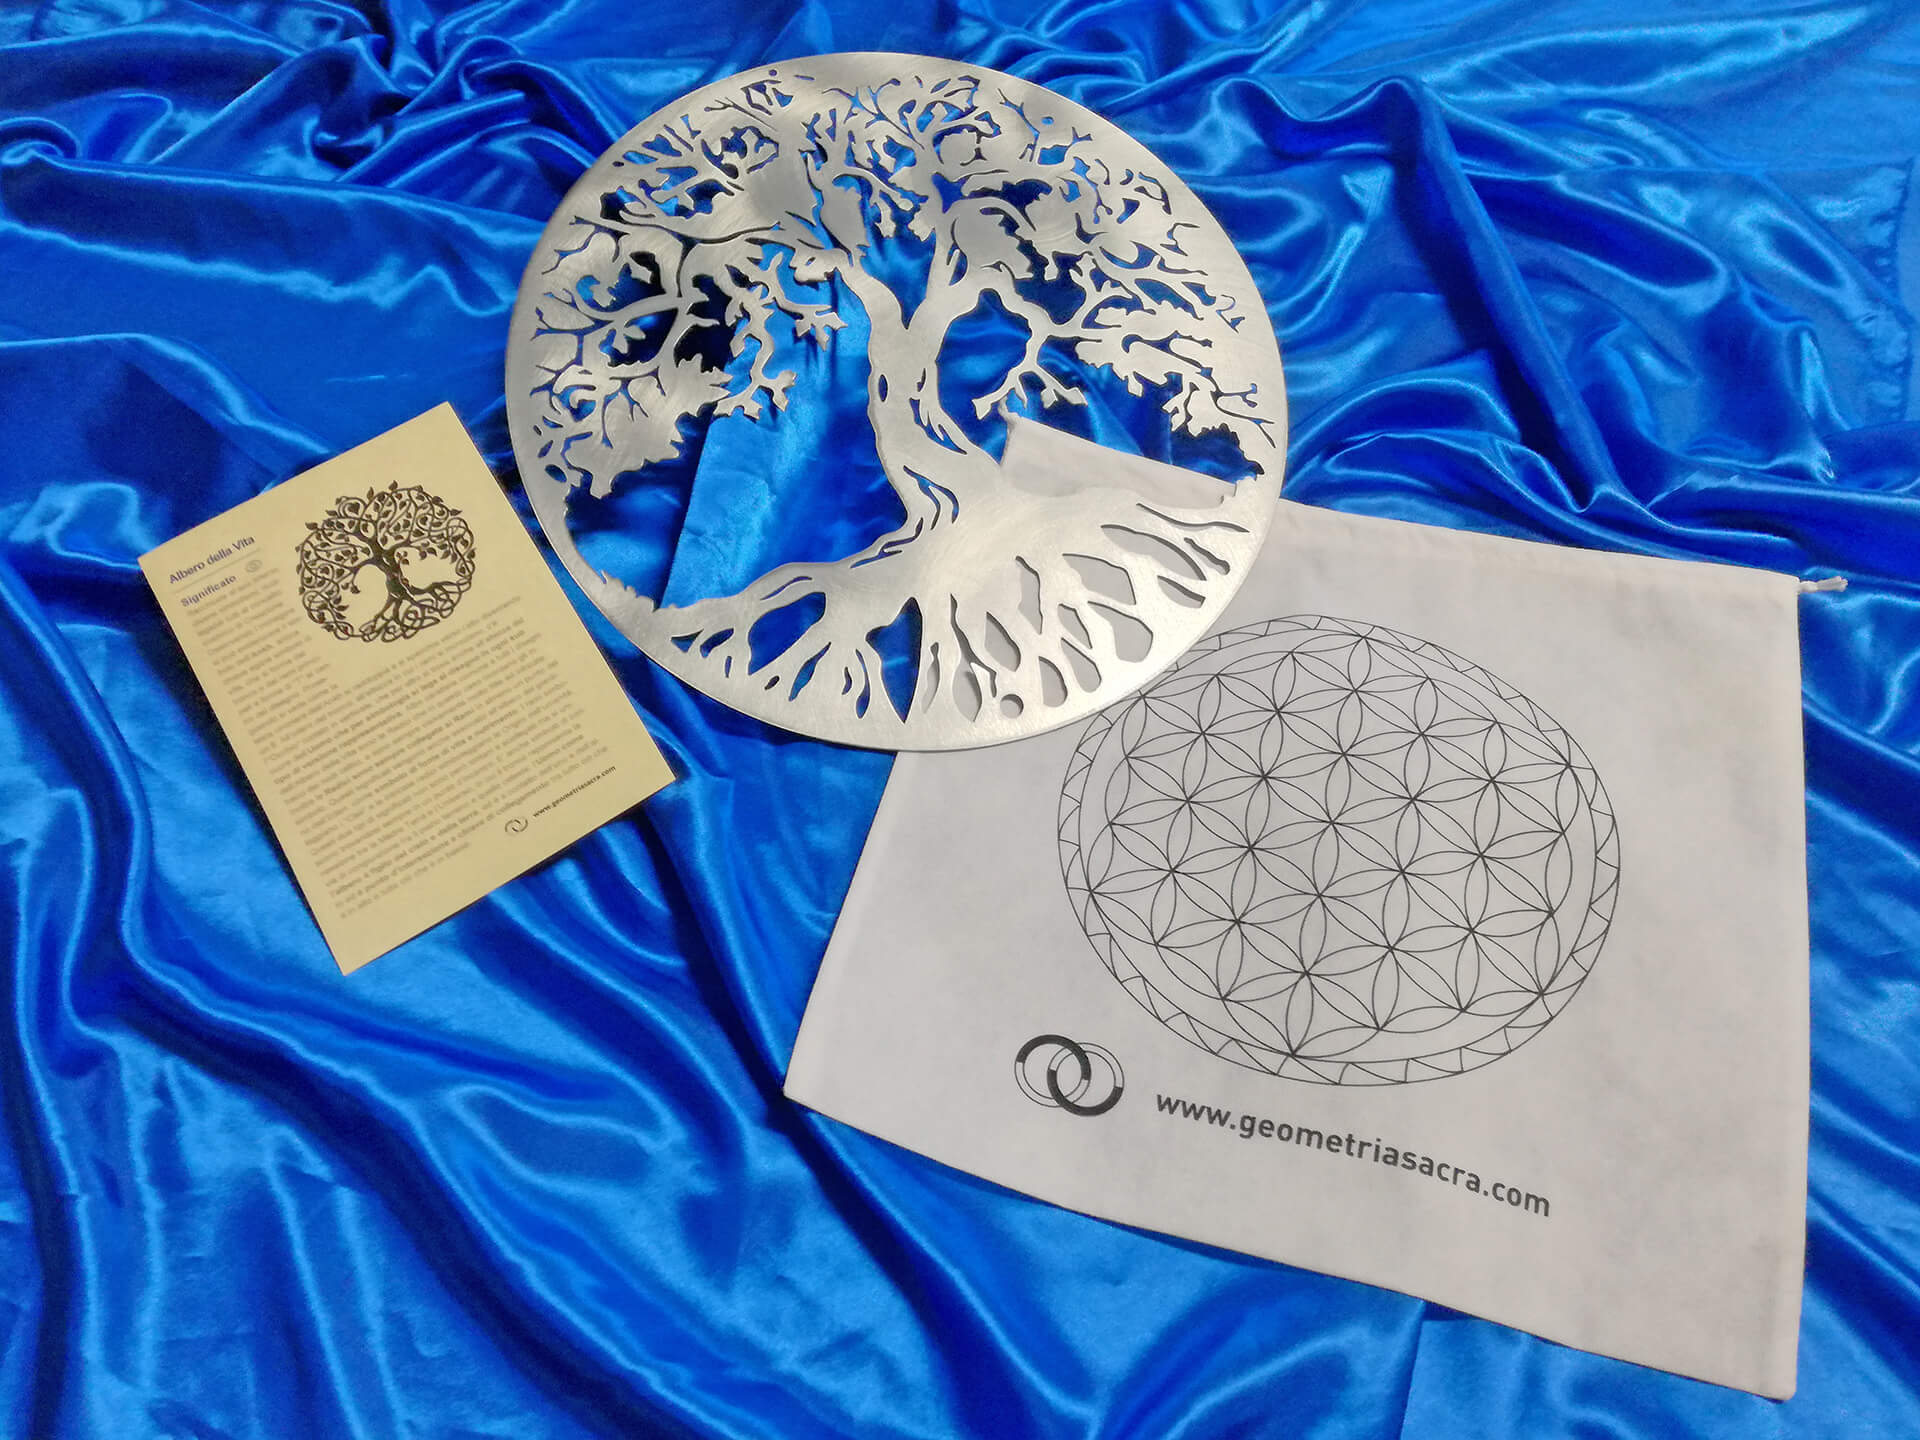 Certificato Geometria Sacra